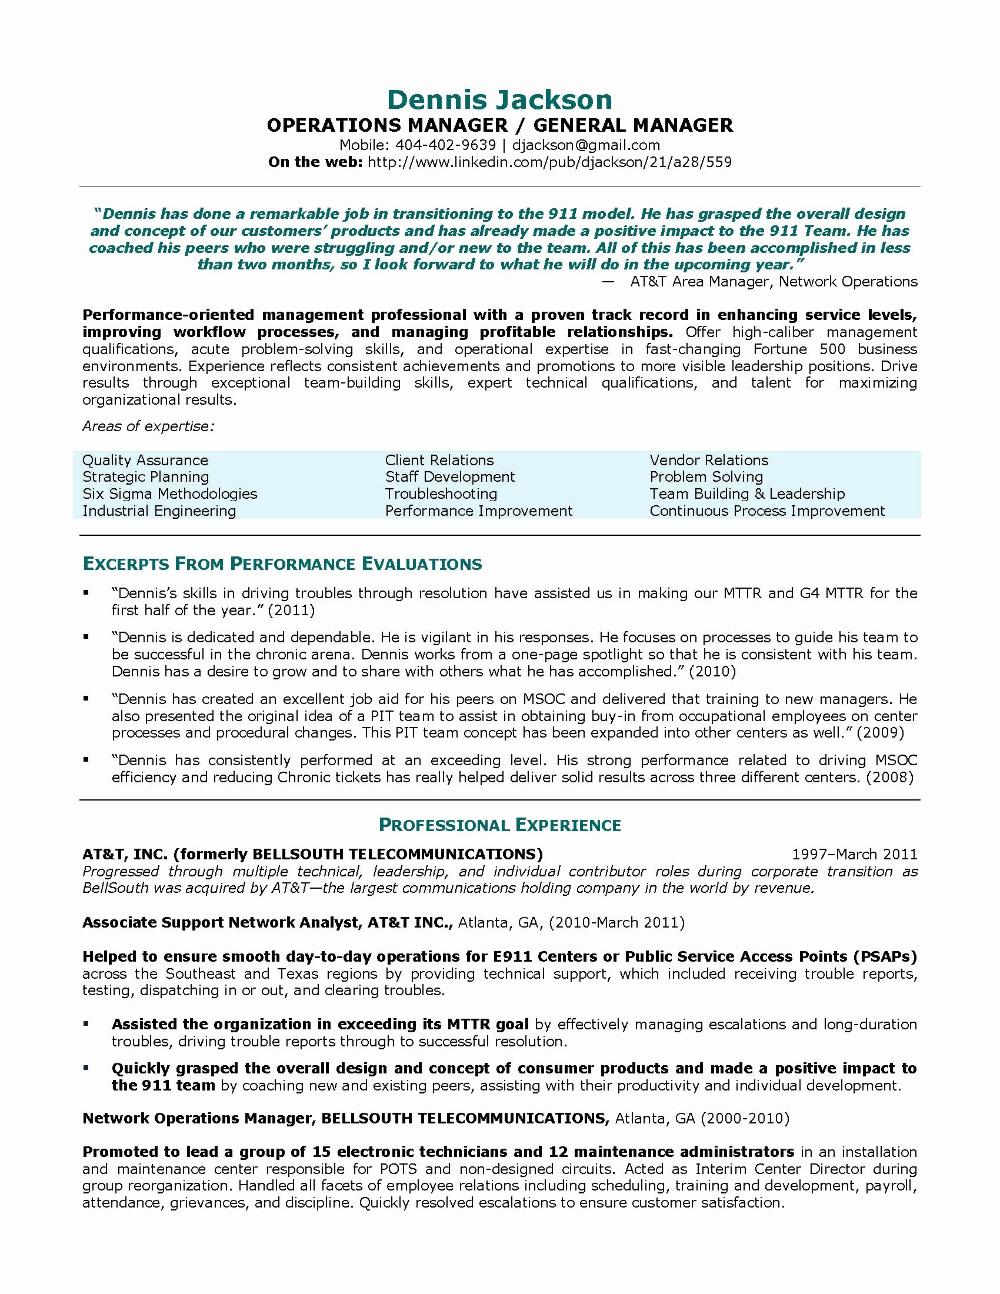 Sample Resume For Operations Manager In Bpo Valid Construction For Operations Manager Report T Job Resume Examples Project Manager Resume Operations Management